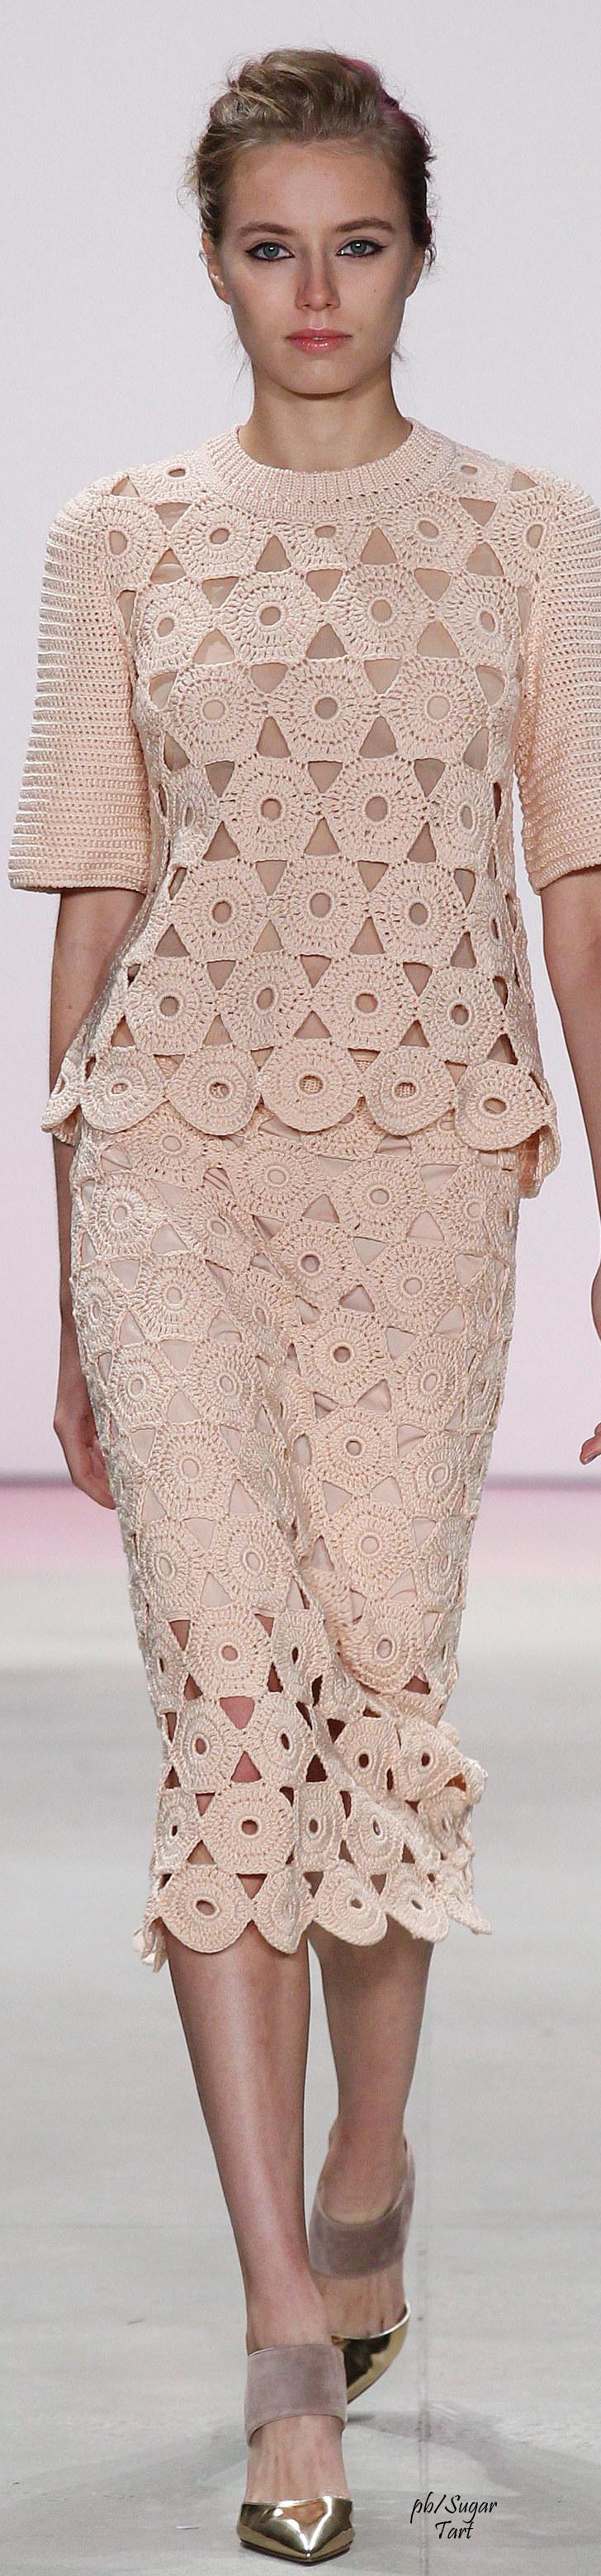 Lela Rose Spring 2016 RTW | Crochet Top | Pinterest | Vestiditos ...